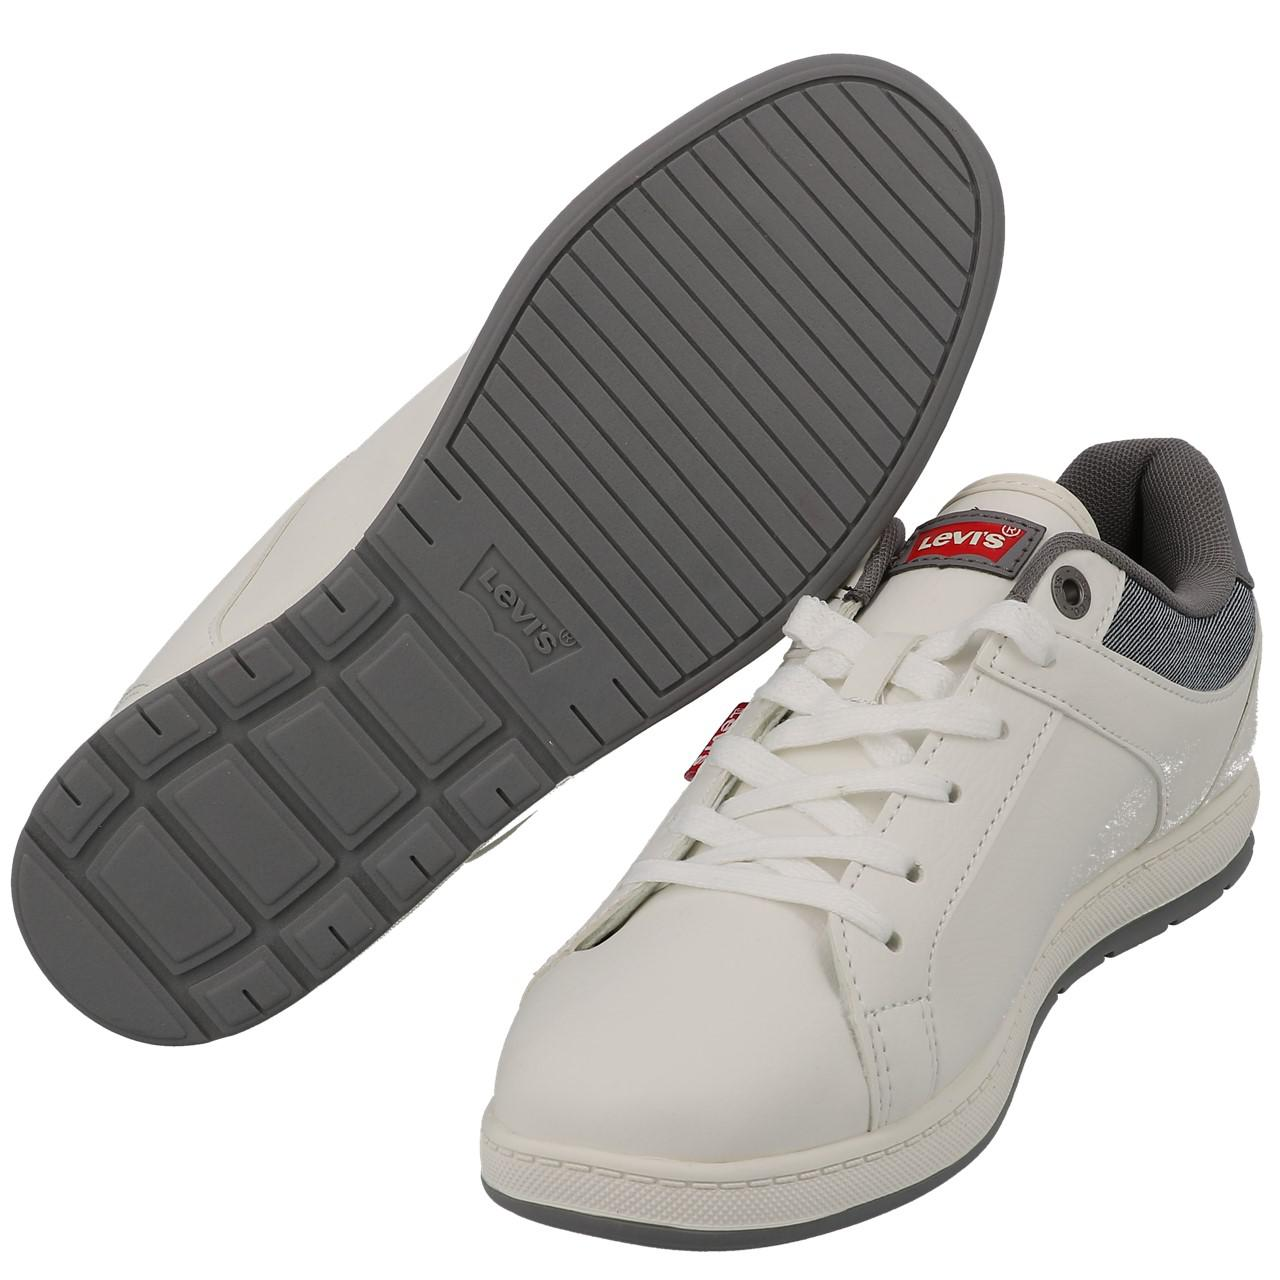 Chaussures-mode-ville-Levis-Declan-blanc-Blanc-53197-Neuf miniature 5